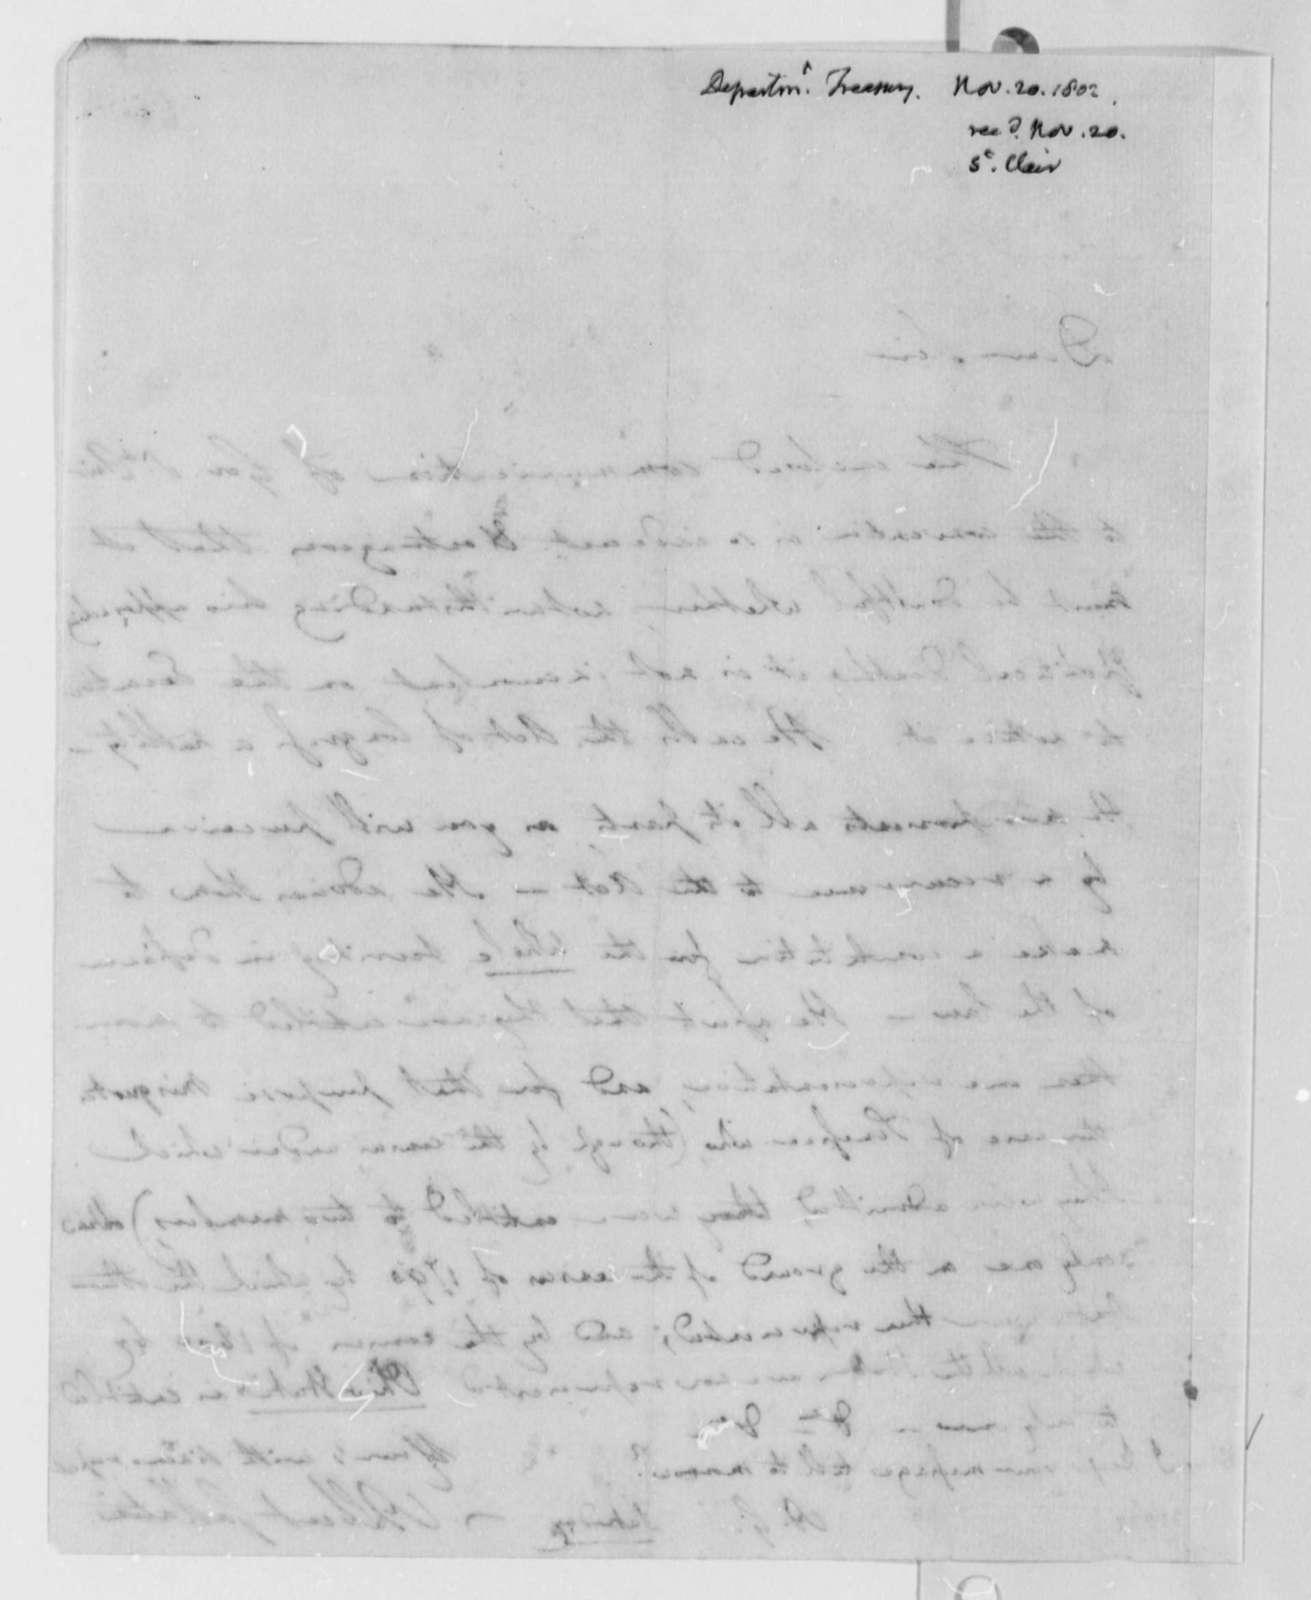 Albert Gallatin to Thomas Jefferson, November 20, 1802